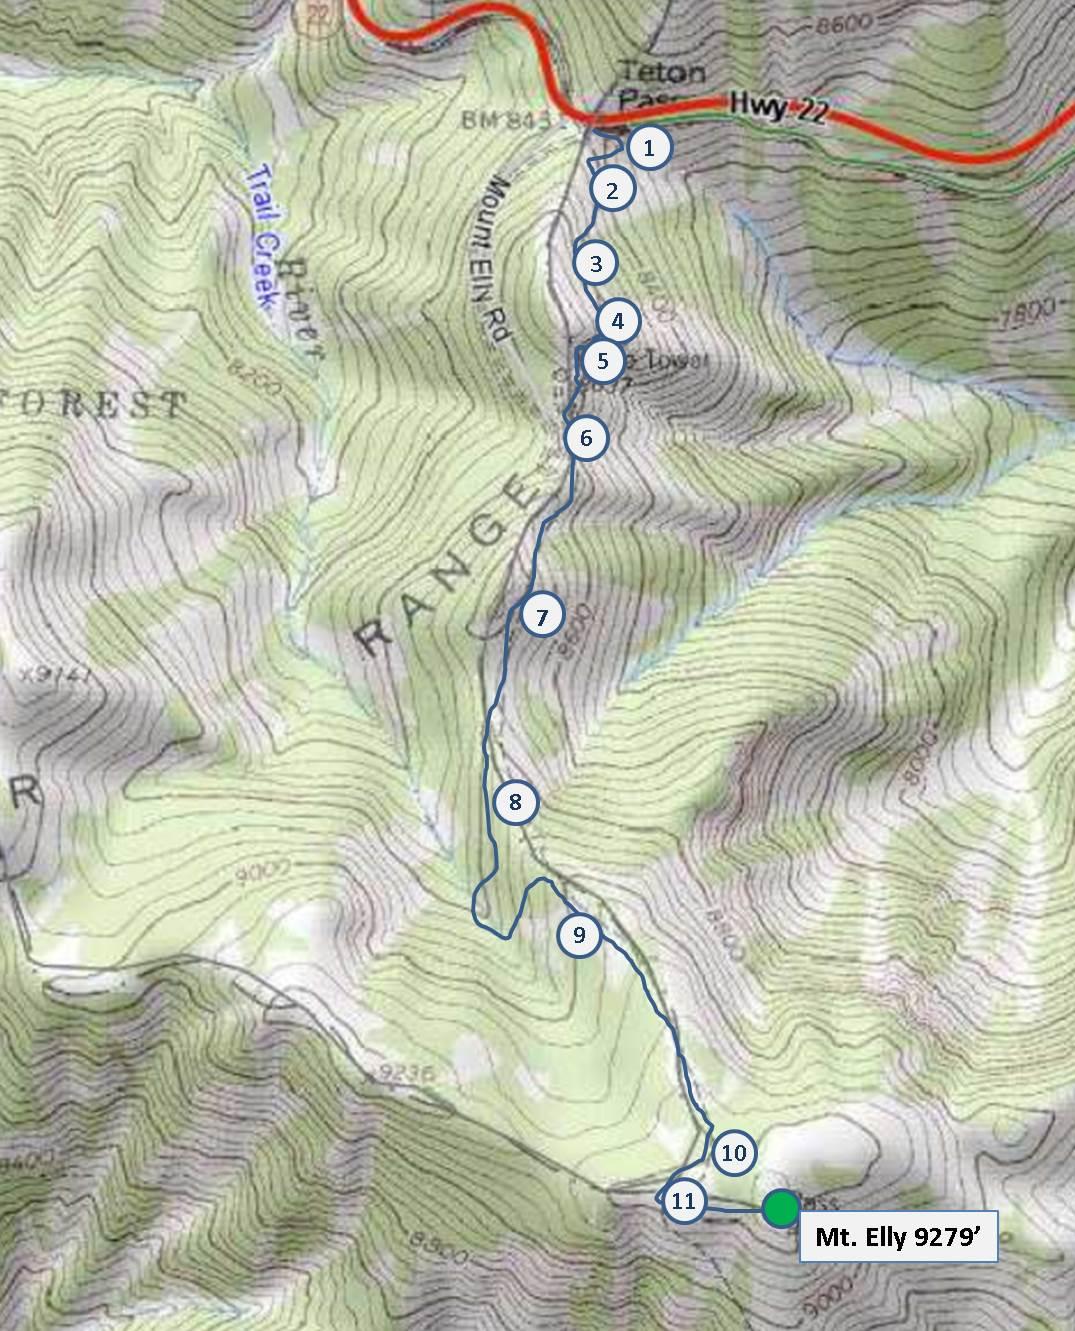 Tetpass map_sm_7.26.20